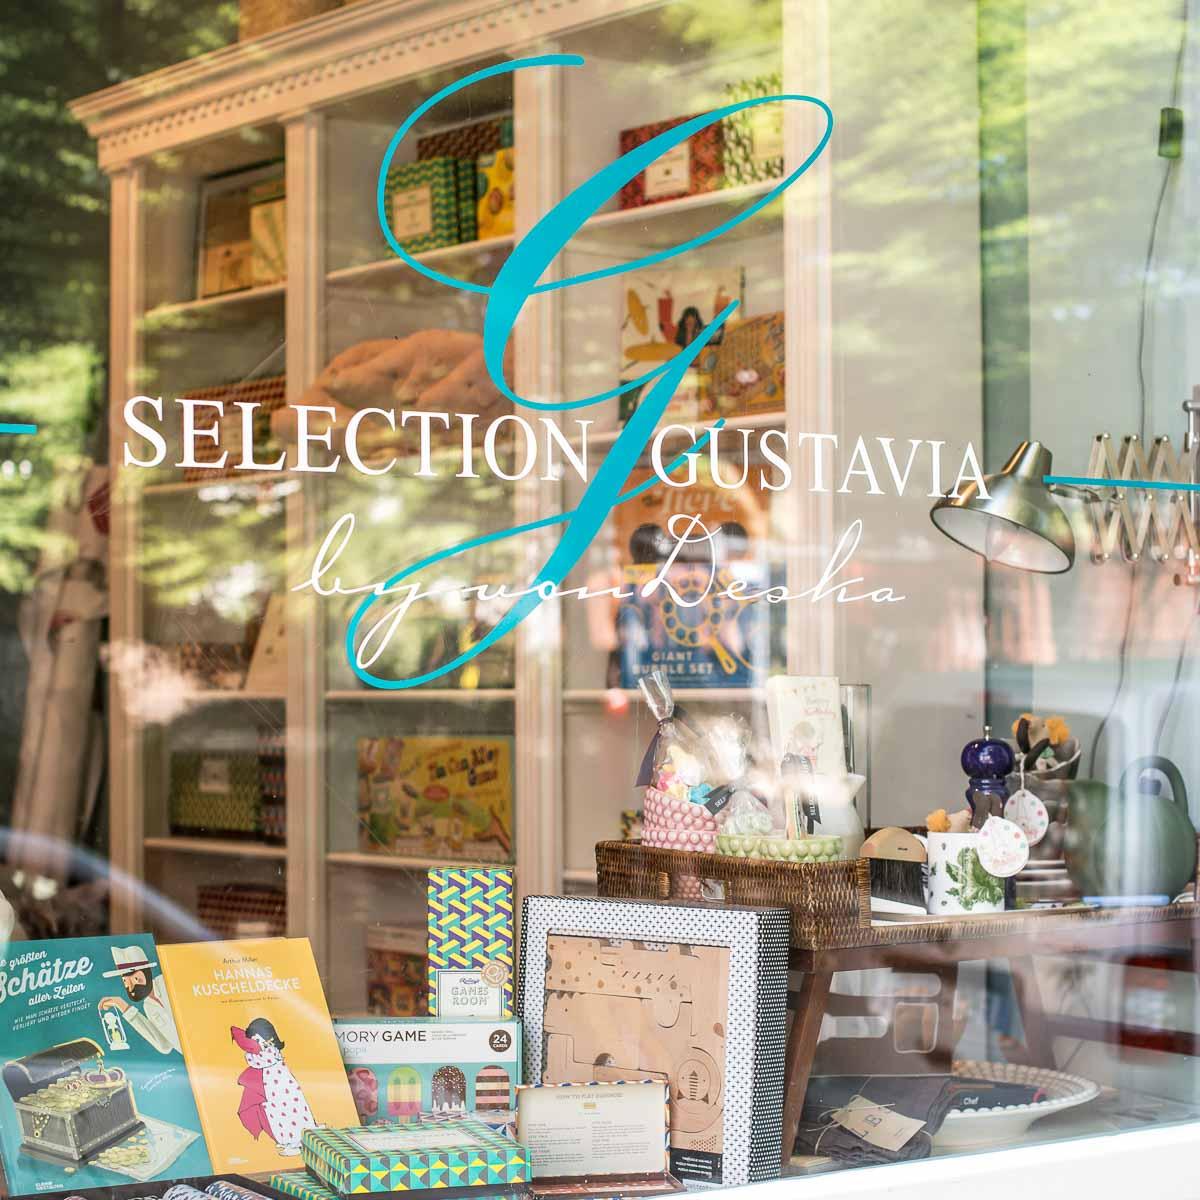 Selection Gustavia Store Hamburg-4